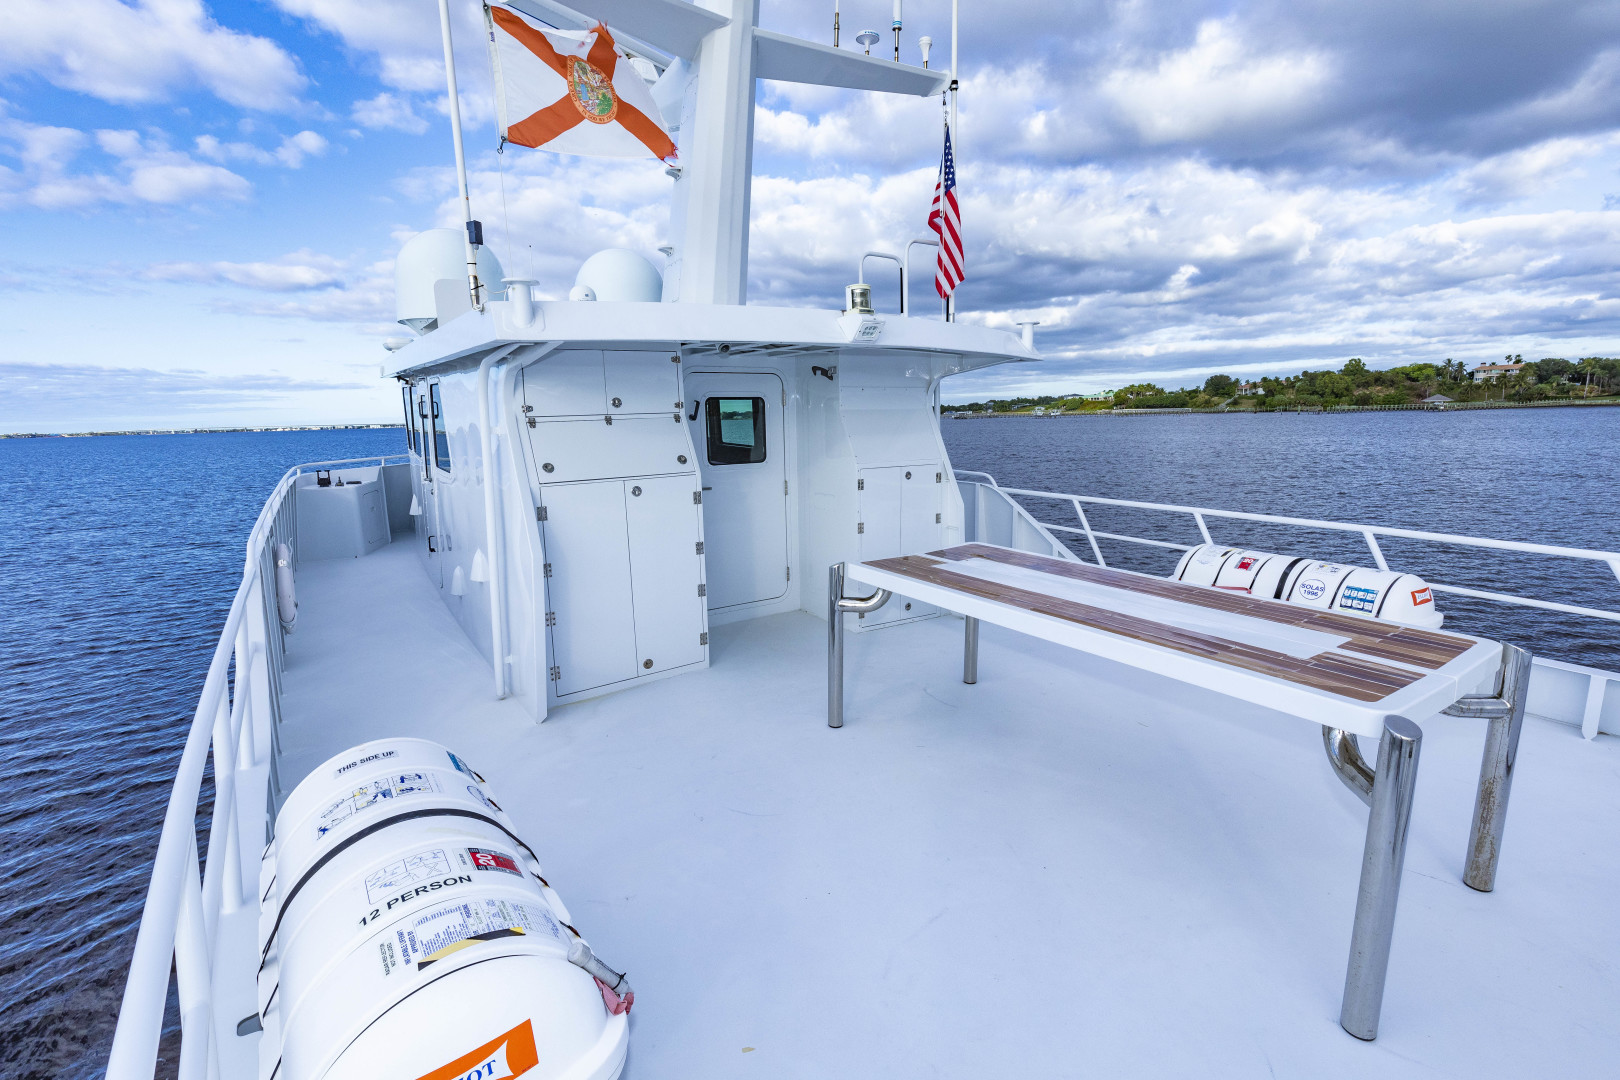 GlassTech-Expedition Yacht 2018-Reset Stuart-Florida-United States-Aft Deck-1568552 | Thumbnail